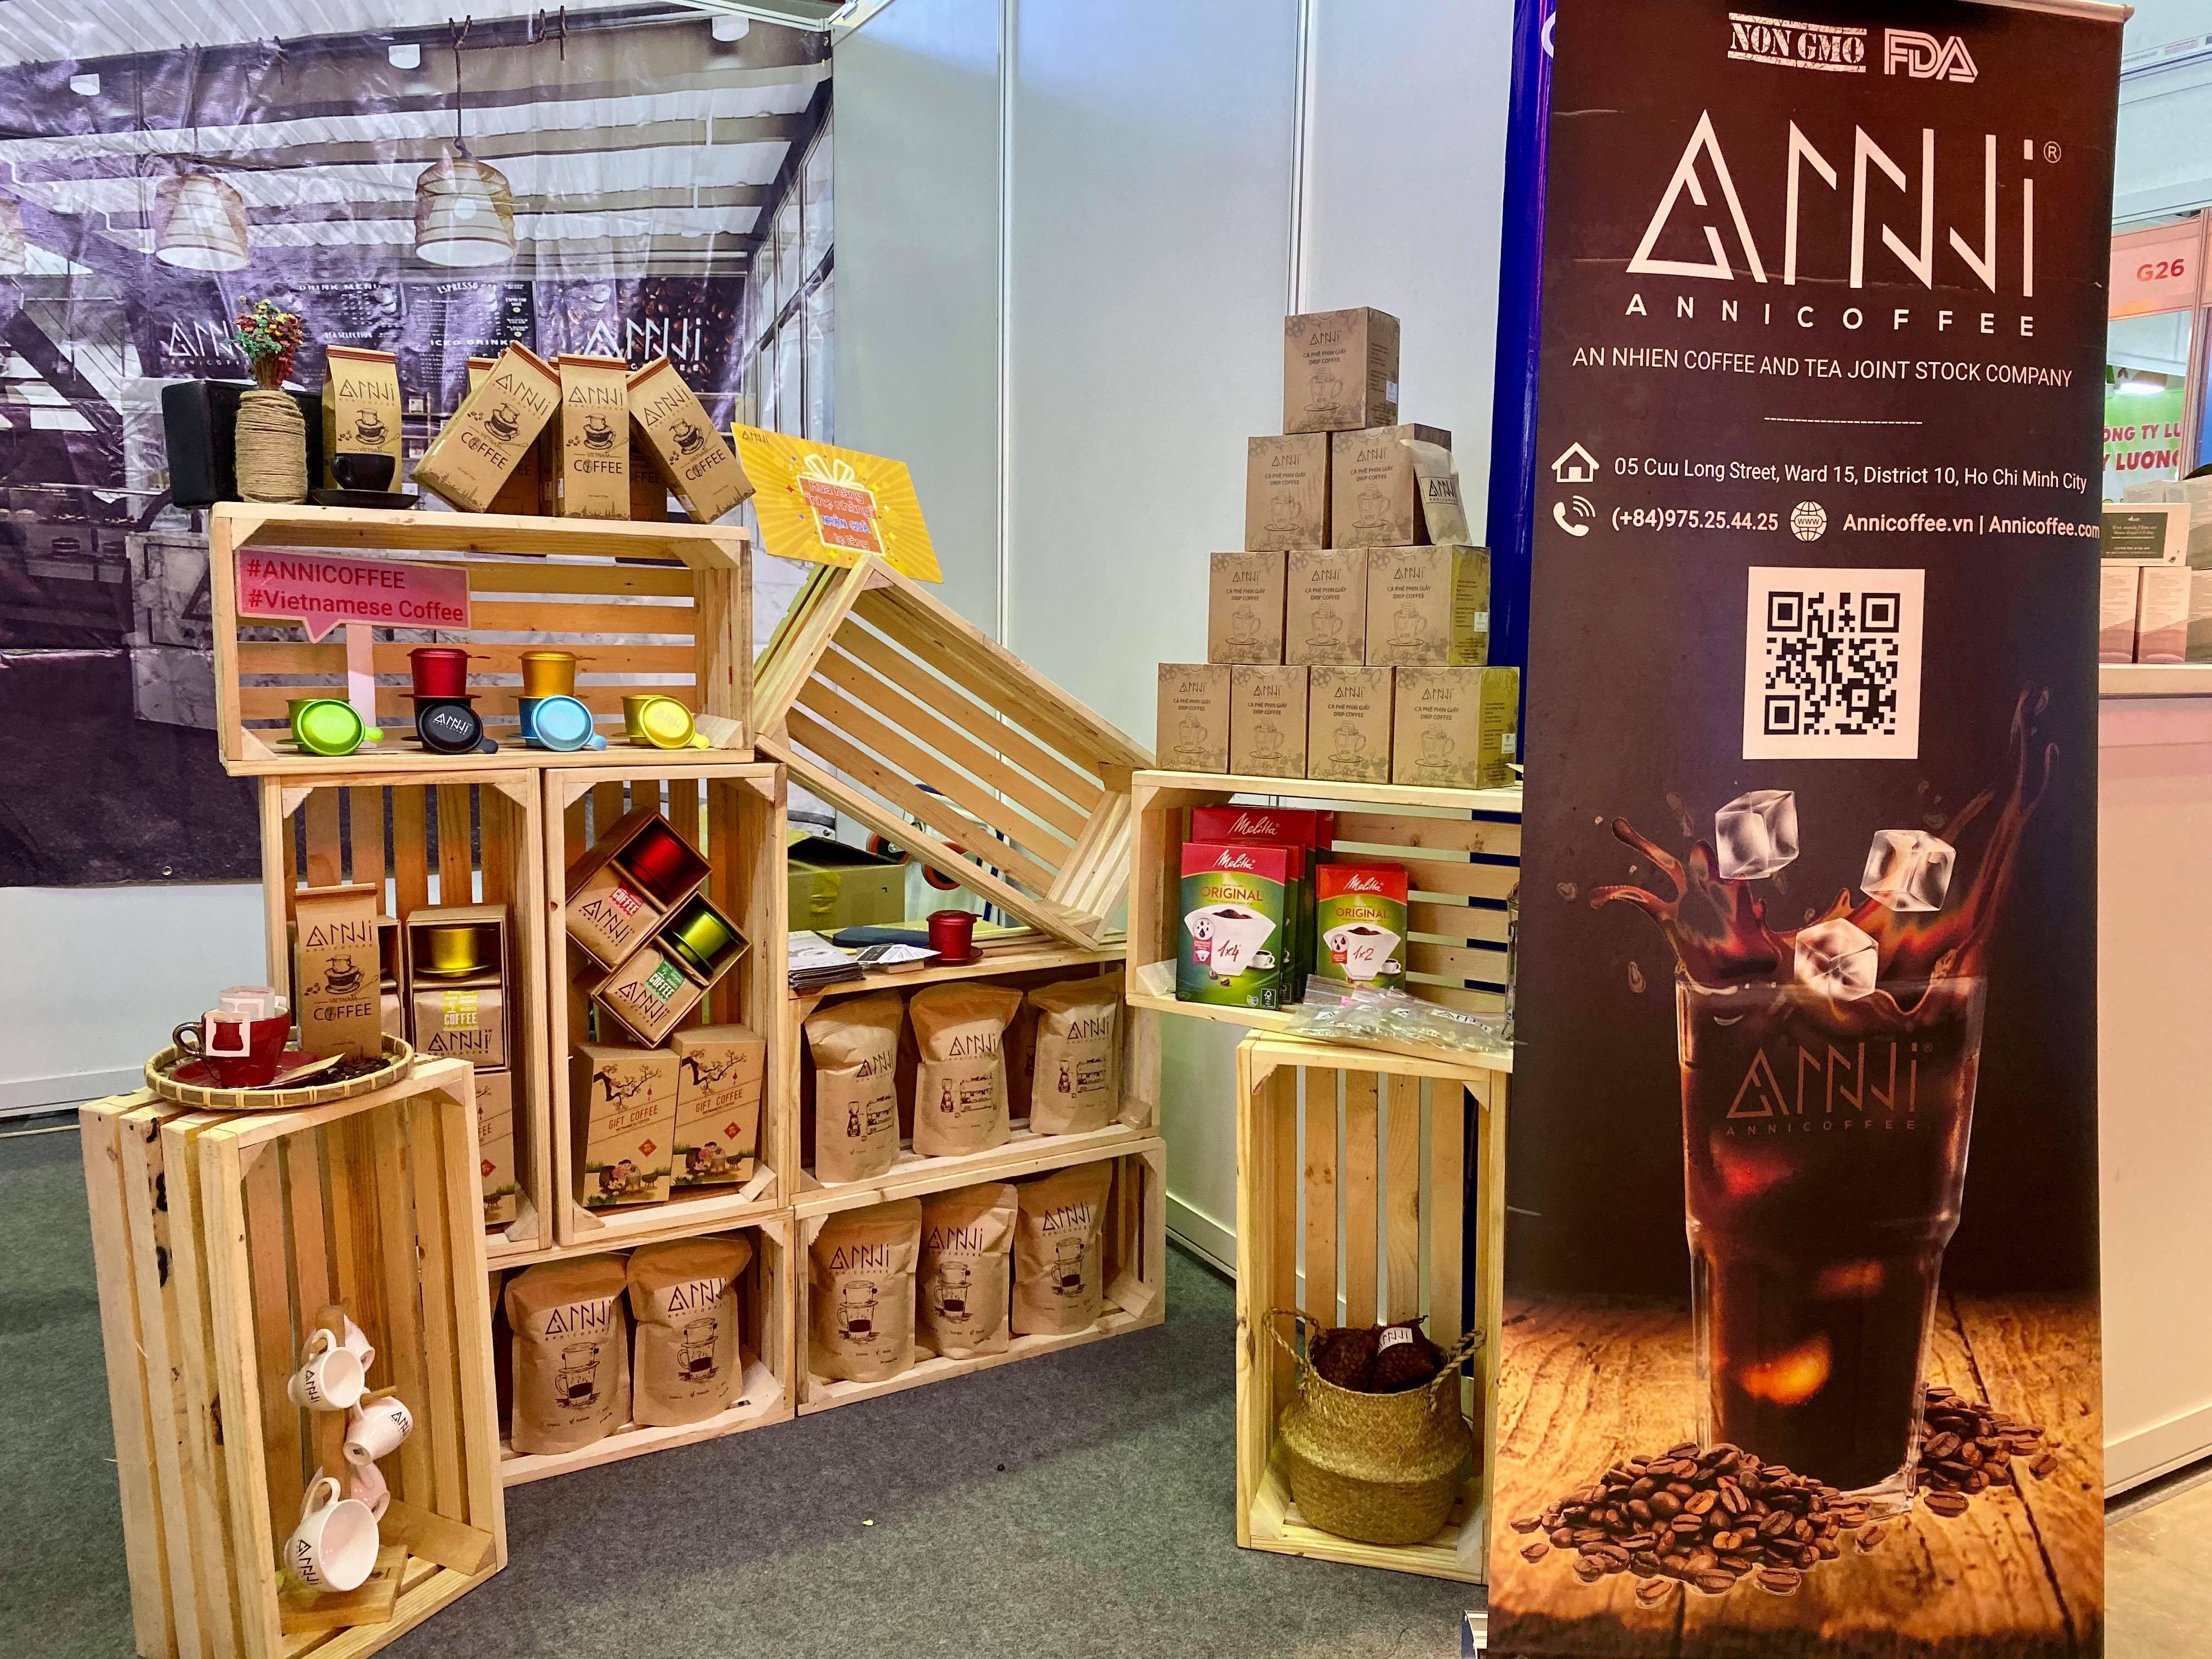 Gian hàng Anni Coffee 2019